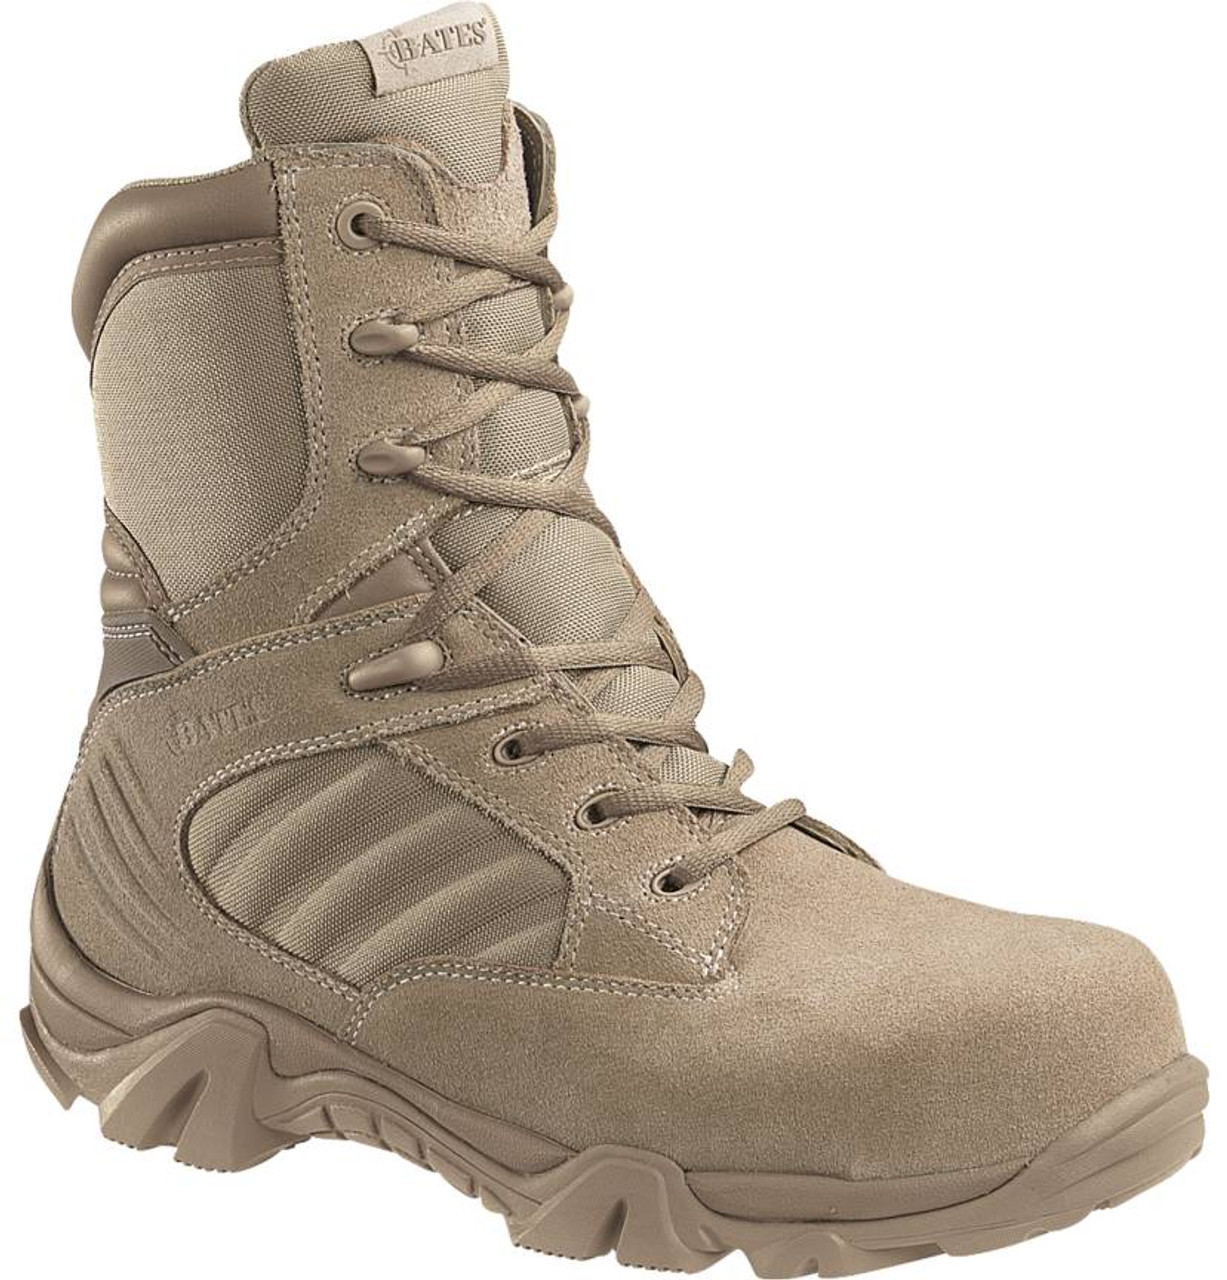 ... Bates E02276 GX-8 Desert Composite Toe Side Zip Boots